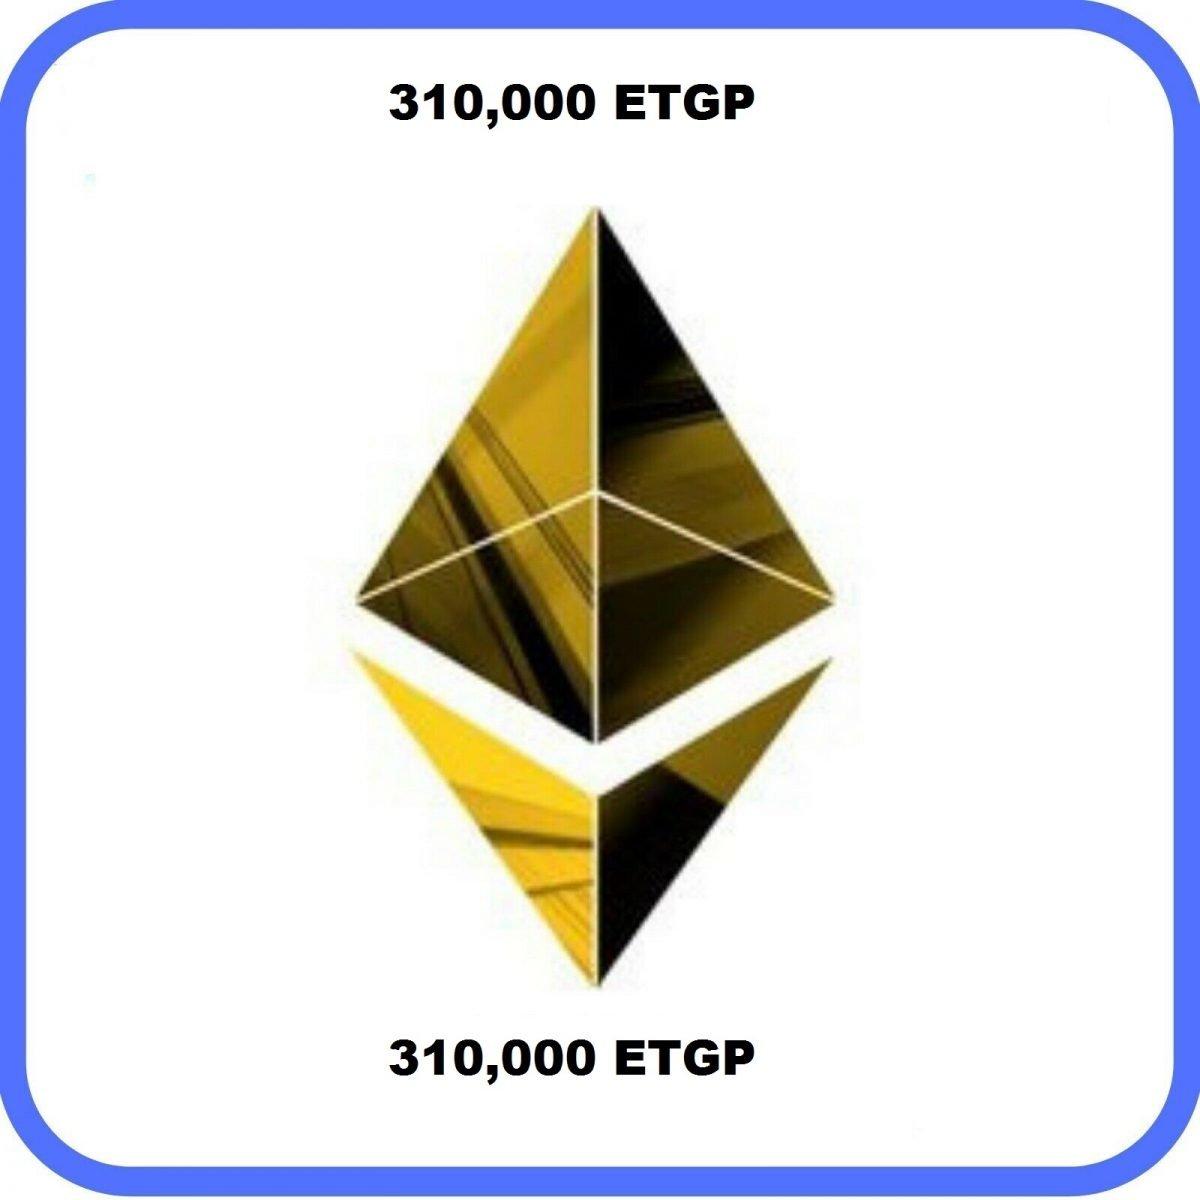 Etgp project